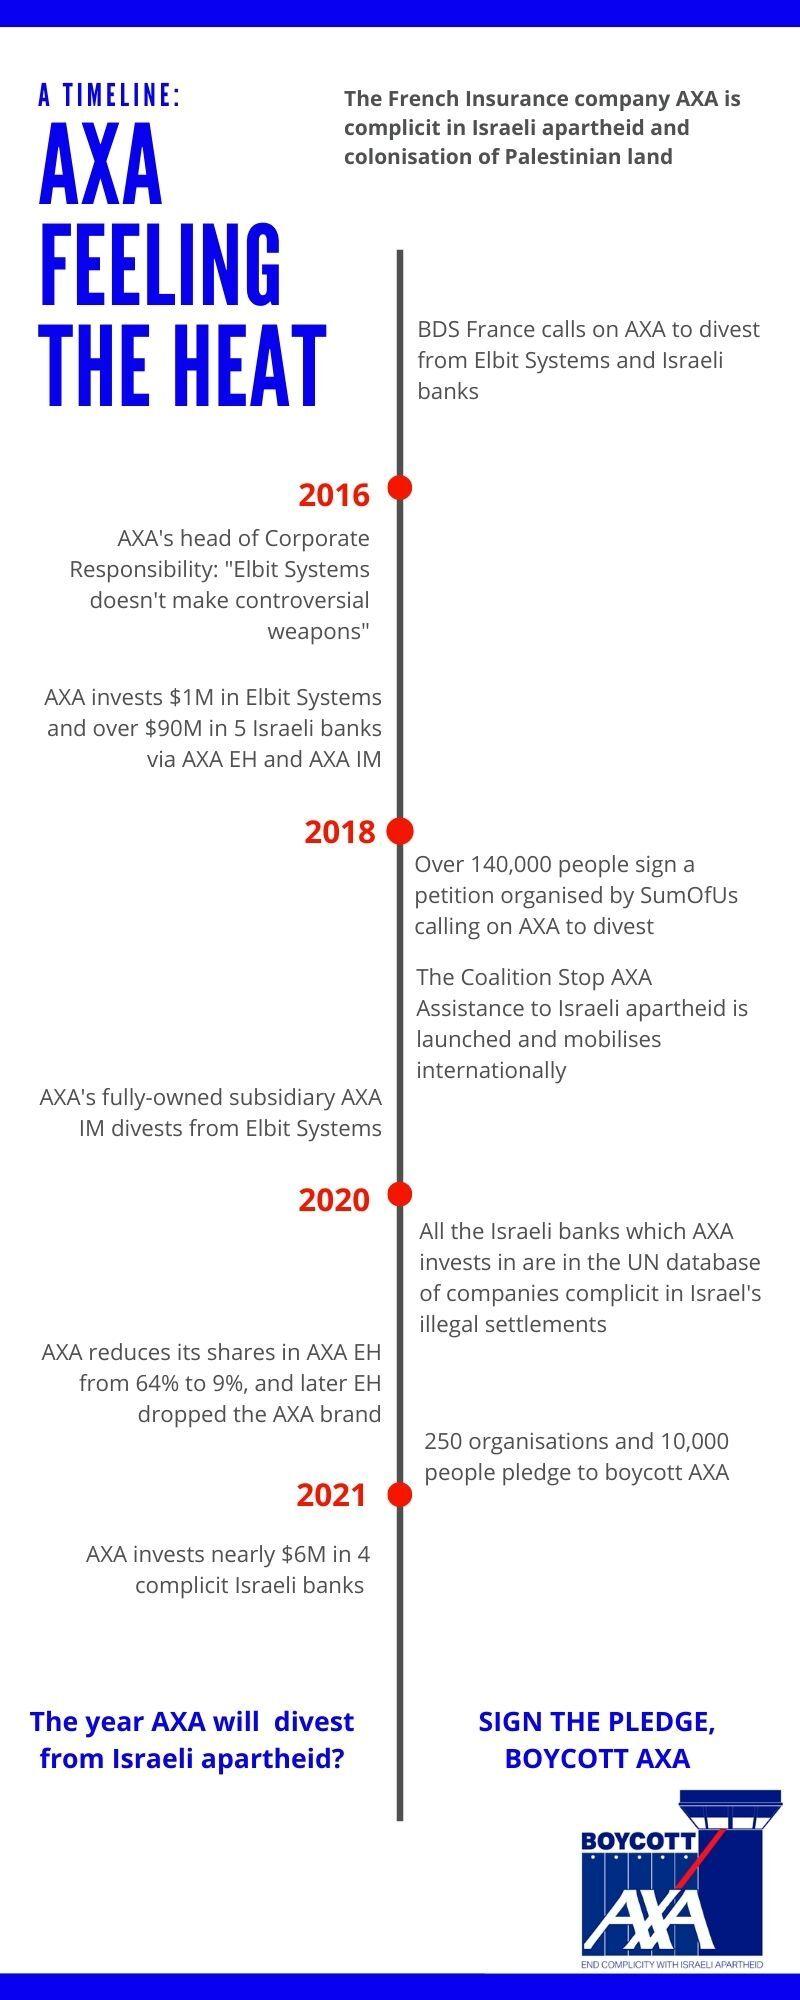 AXA timeline